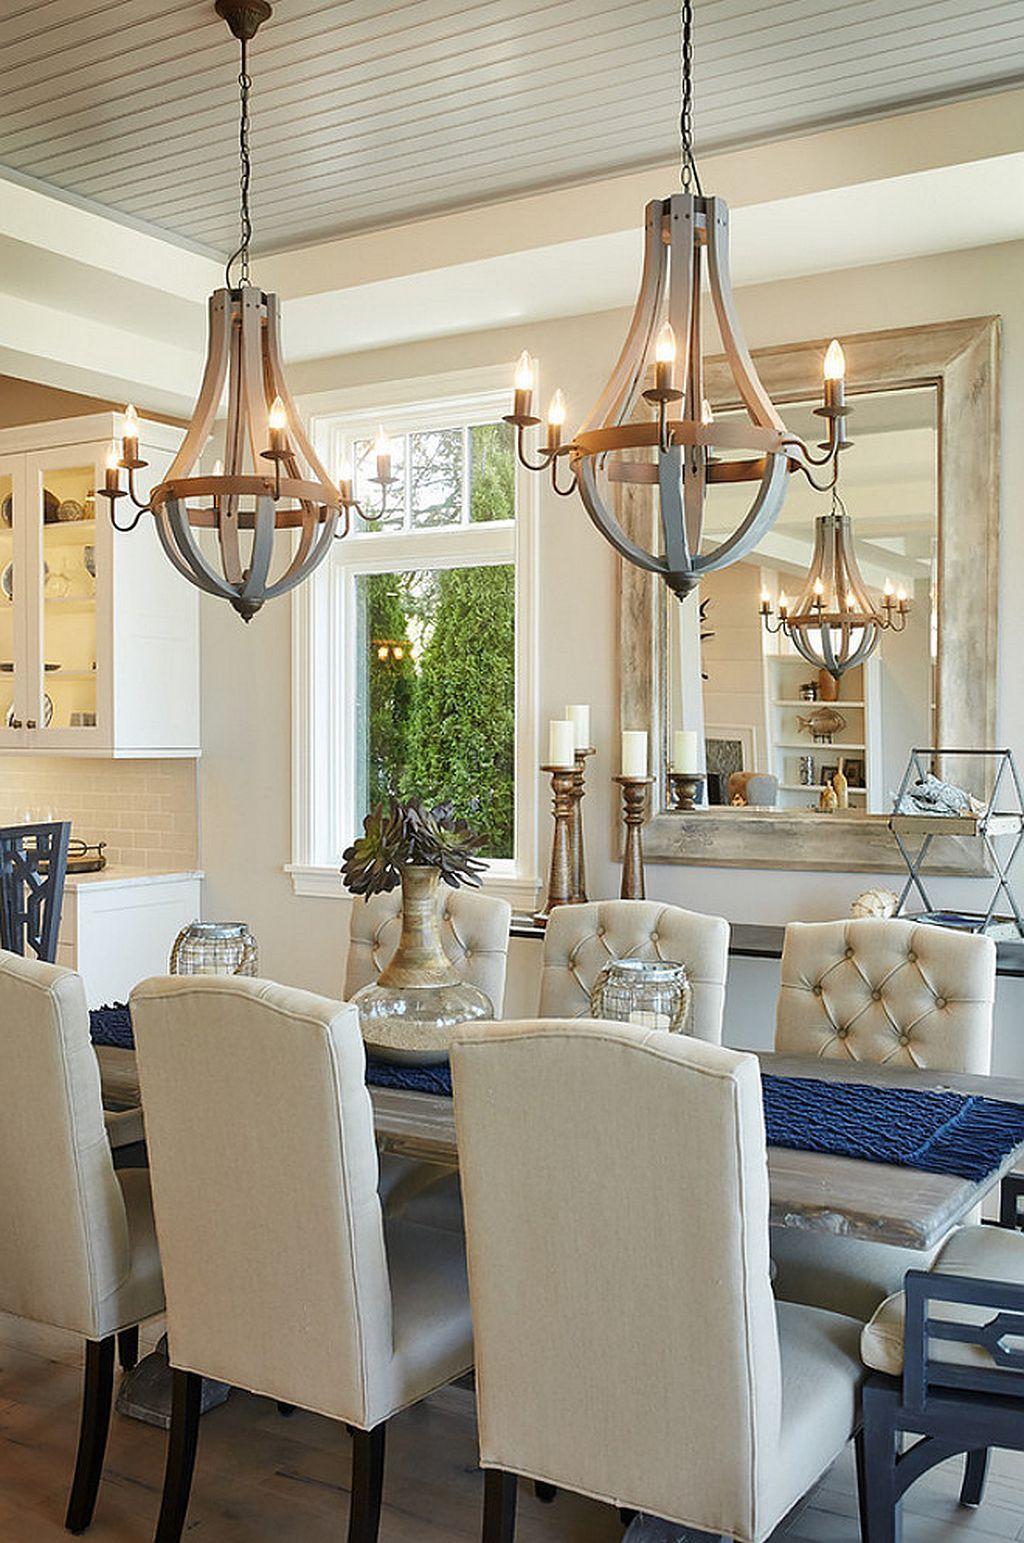 60 Dining Room Arrangement Ideas 48